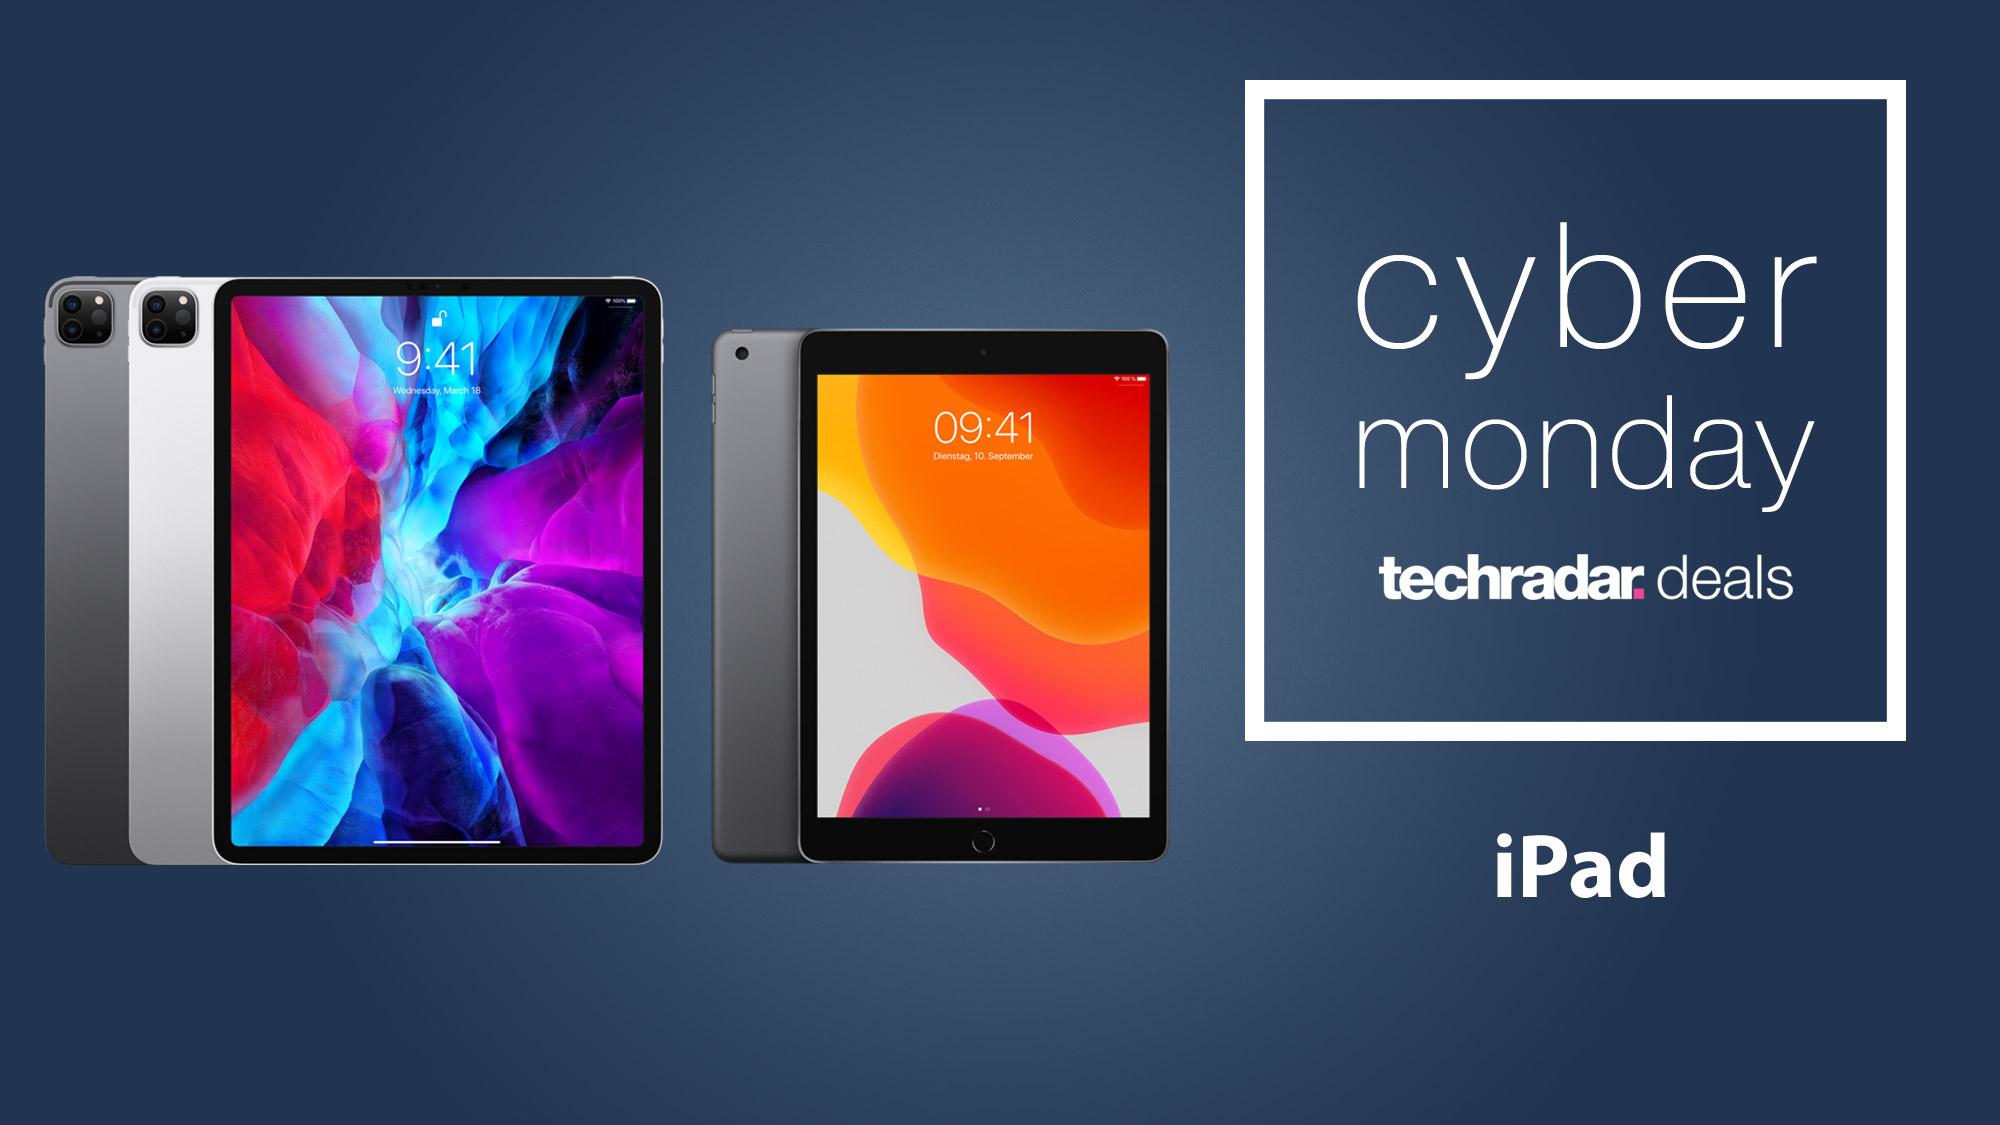 Cyber Monday Ipad Deals 2020 Expected Savings On Ipad Pro Air Mini Ranges Techradar